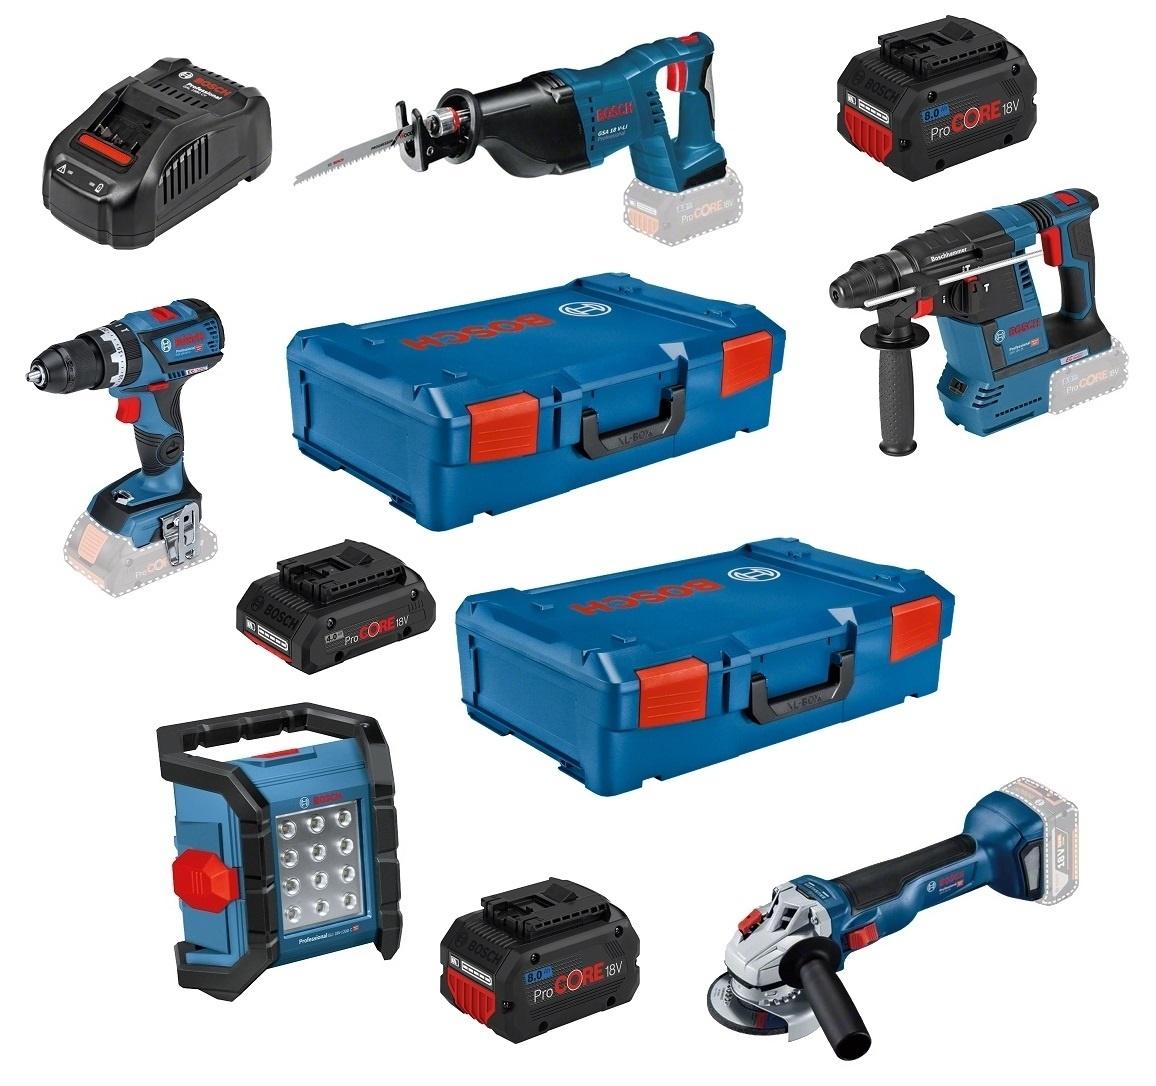 Bosch Werkzeug-Set 5-tlg 18 V + 3x PC 18V + GAL + 2x X-L-Boxx